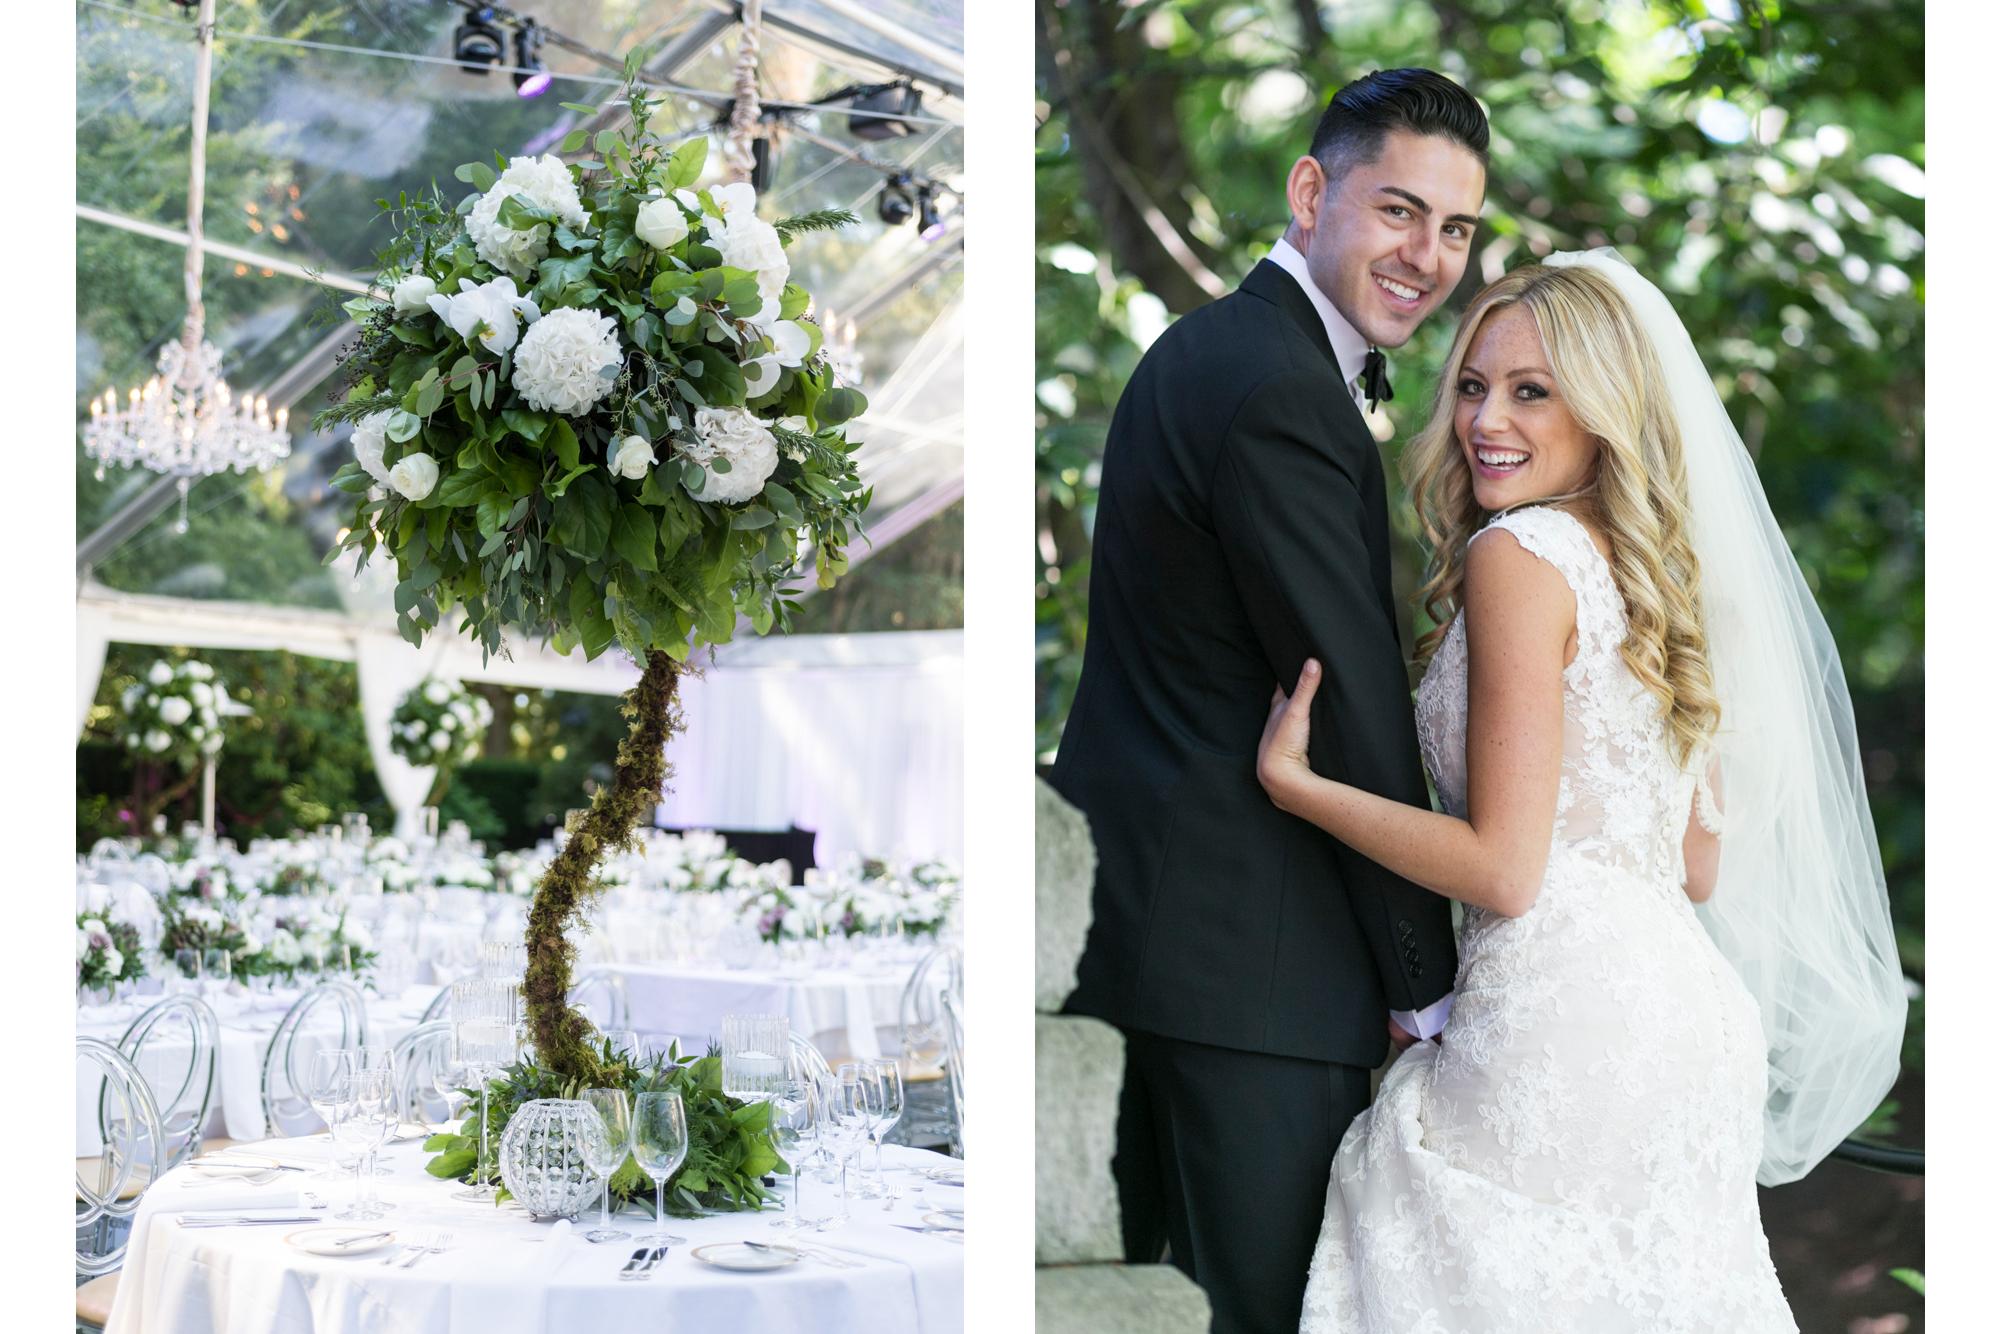 vancouver-luxury-wedding-photographer-lori-miles-15.jpg